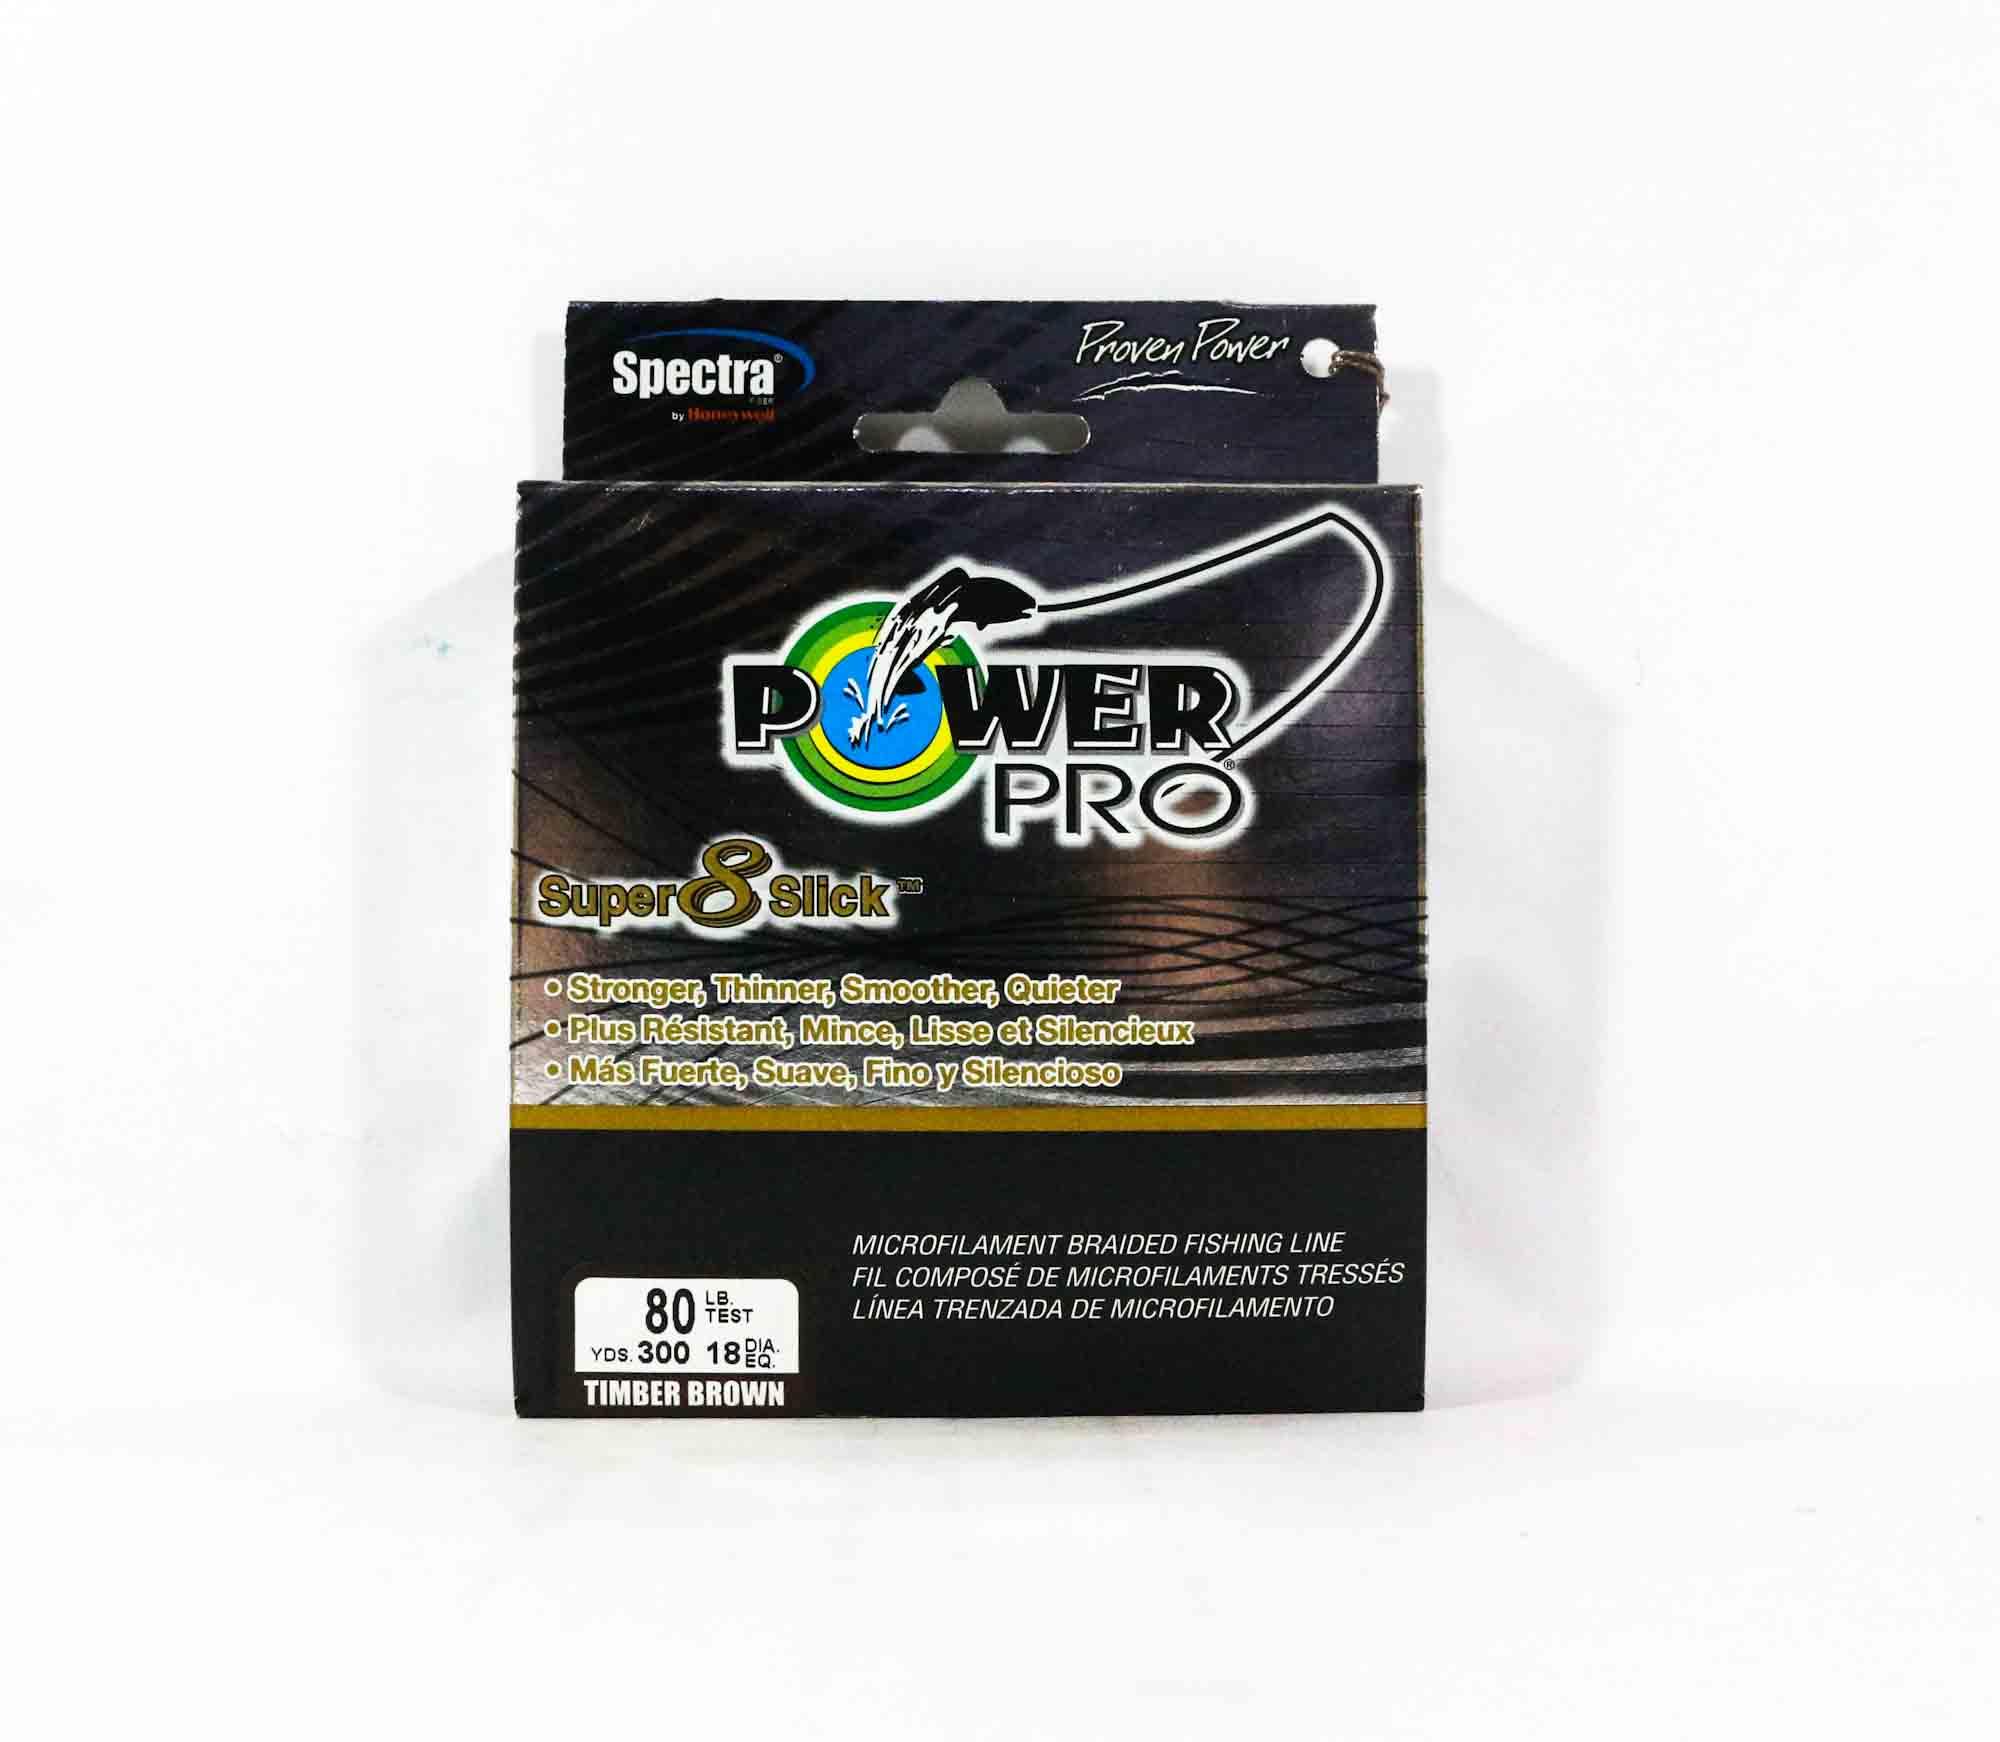 Power Pro Super 8 Slick Spectra Line 80lb by 300yds Brown (0527)